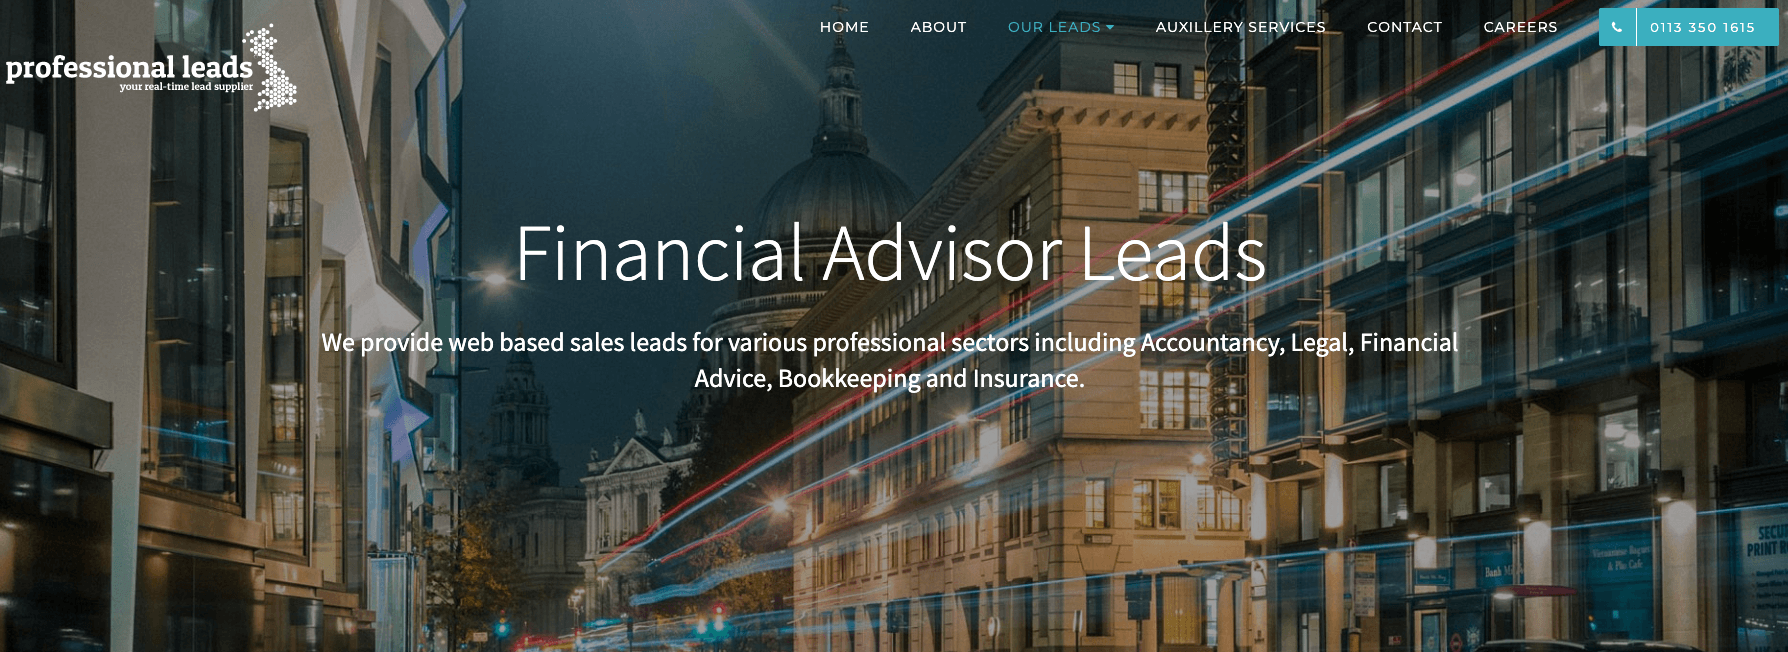 financial adviser lead generation - The Best Lead Generation Companies for Financial Advisers